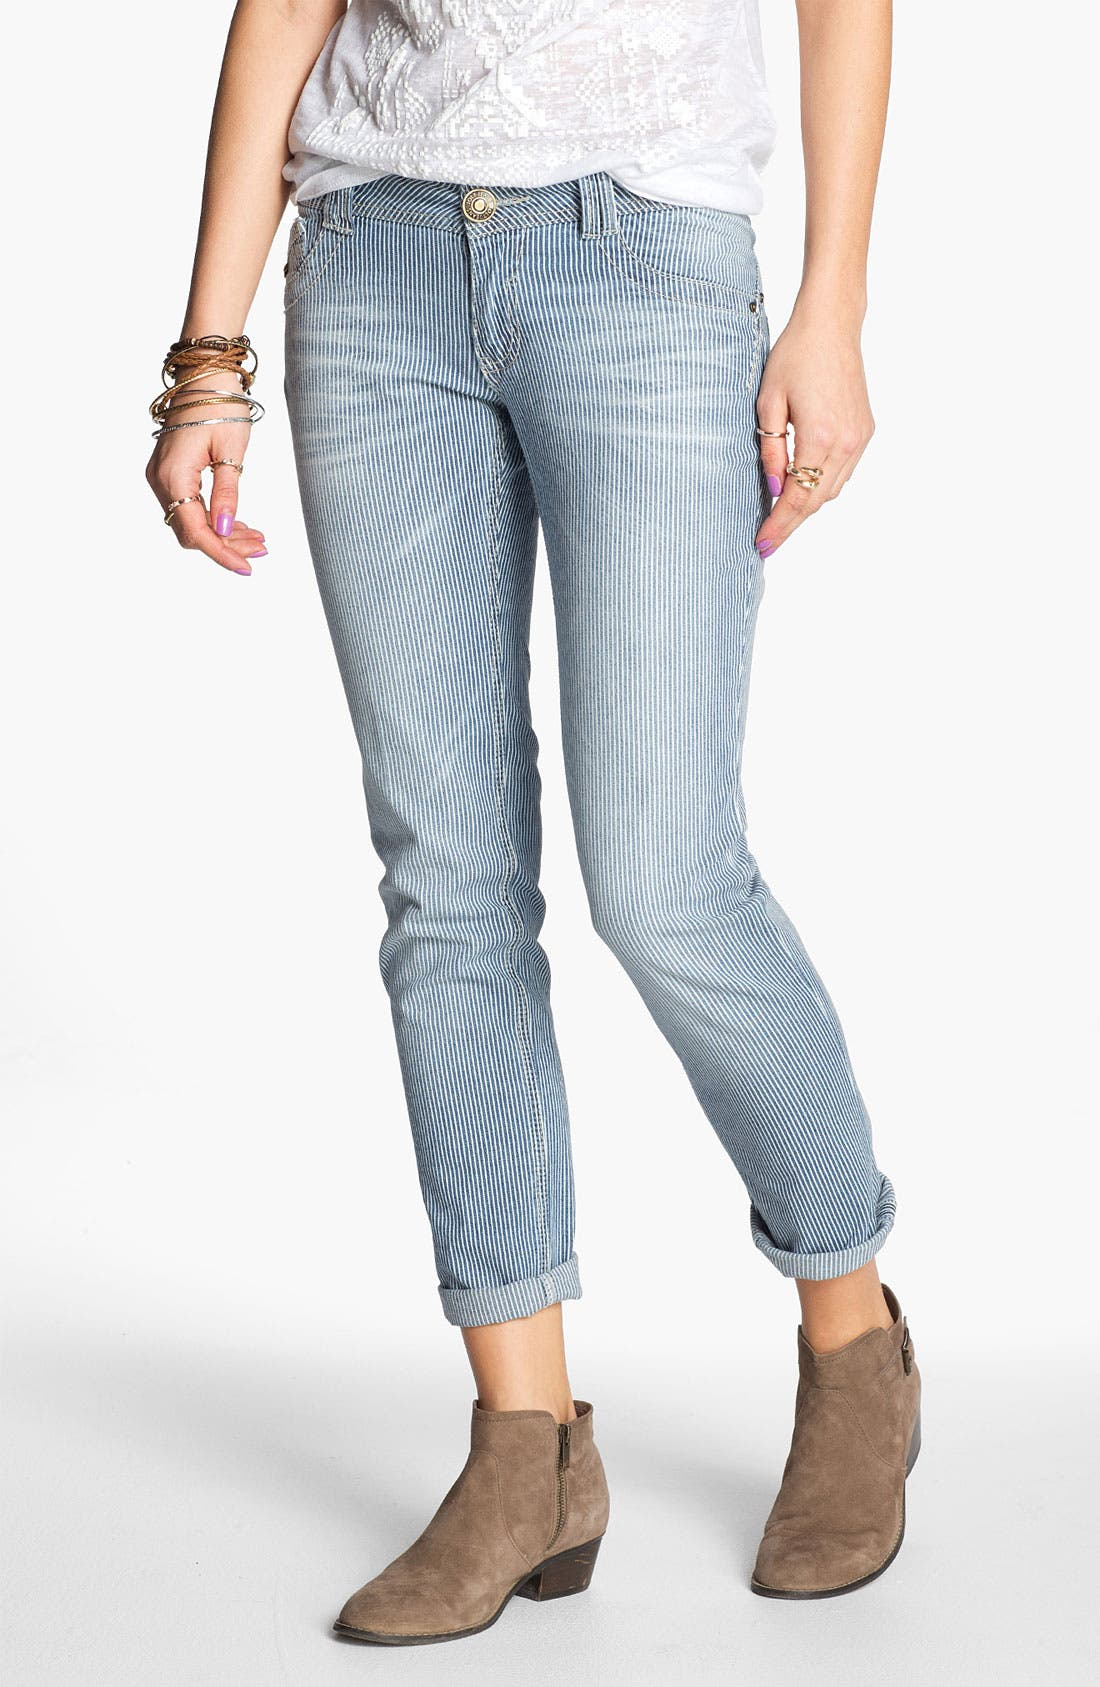 Alternate Image 1 Selected - Jolt 'Railroad Stripe' Crop Skinny Jeans (Juniors)